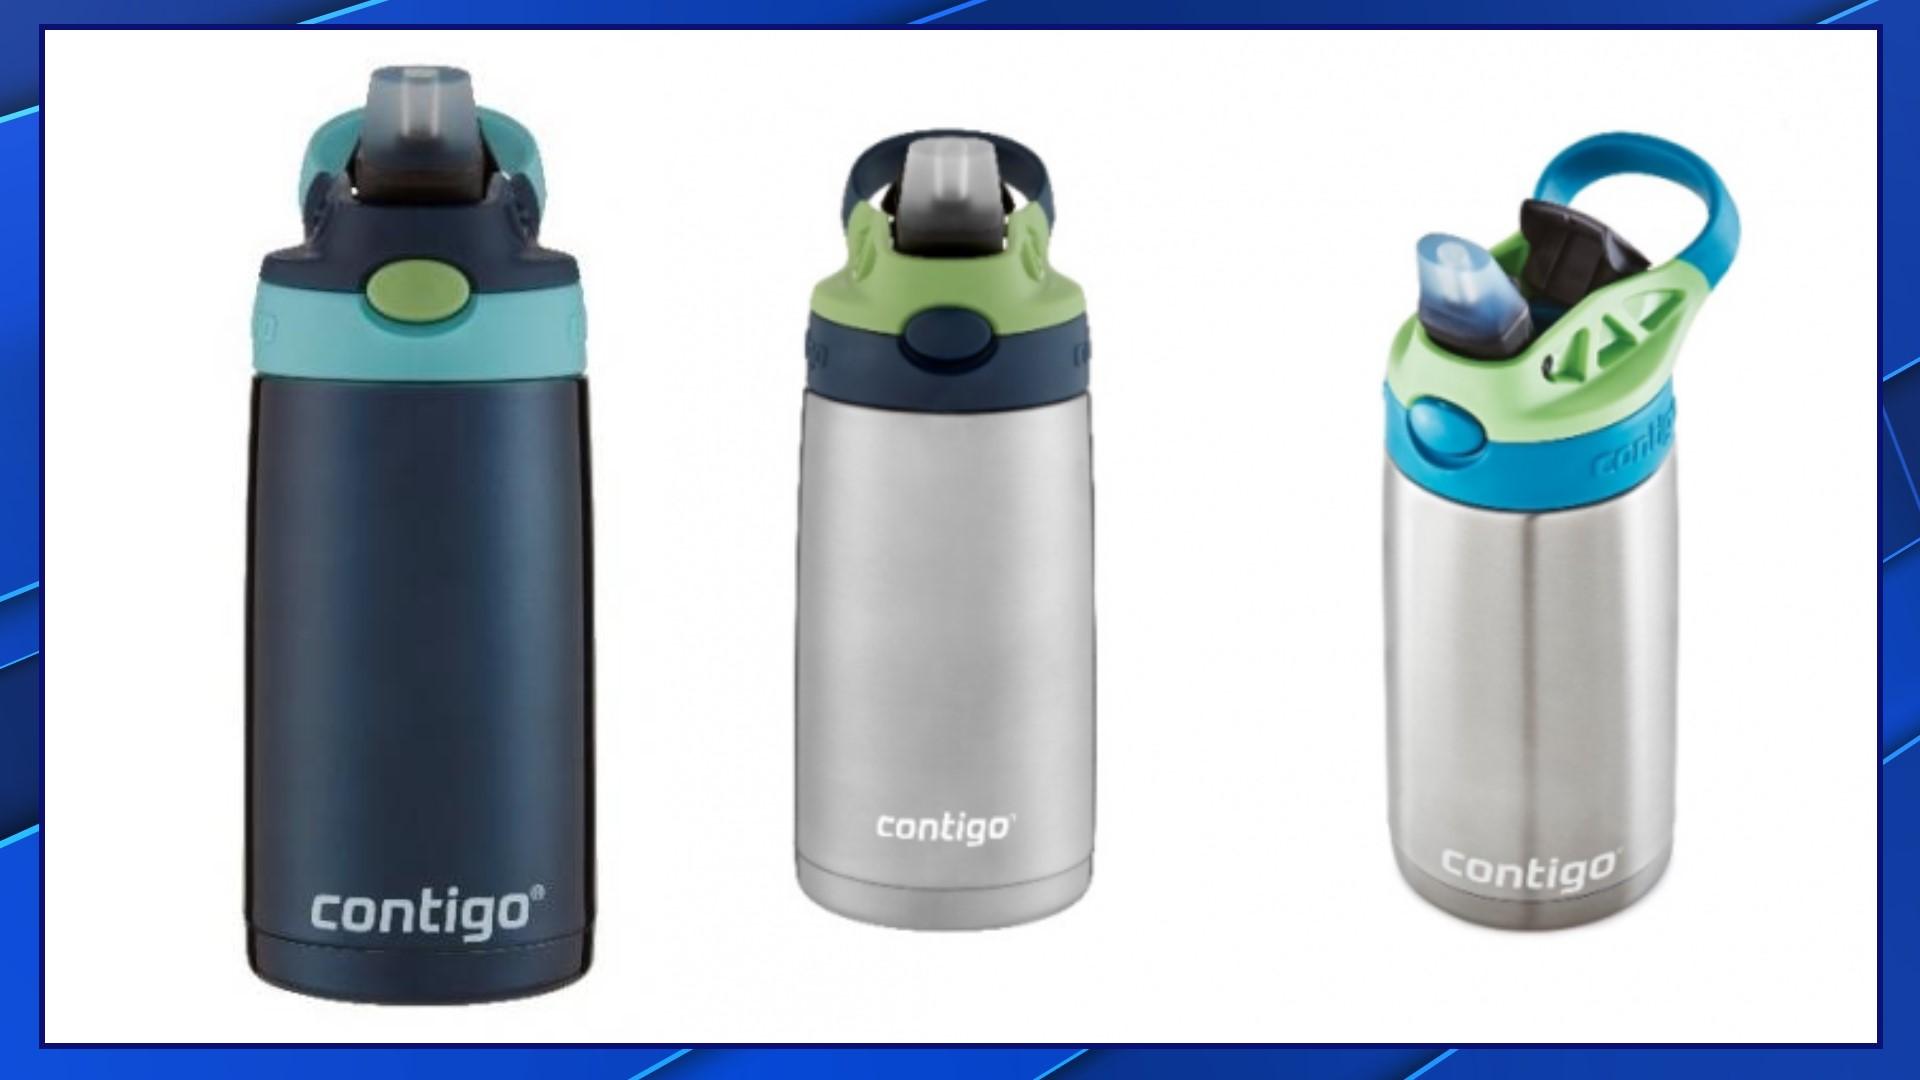 Choking risk prompts recall of 6M kids water bottles